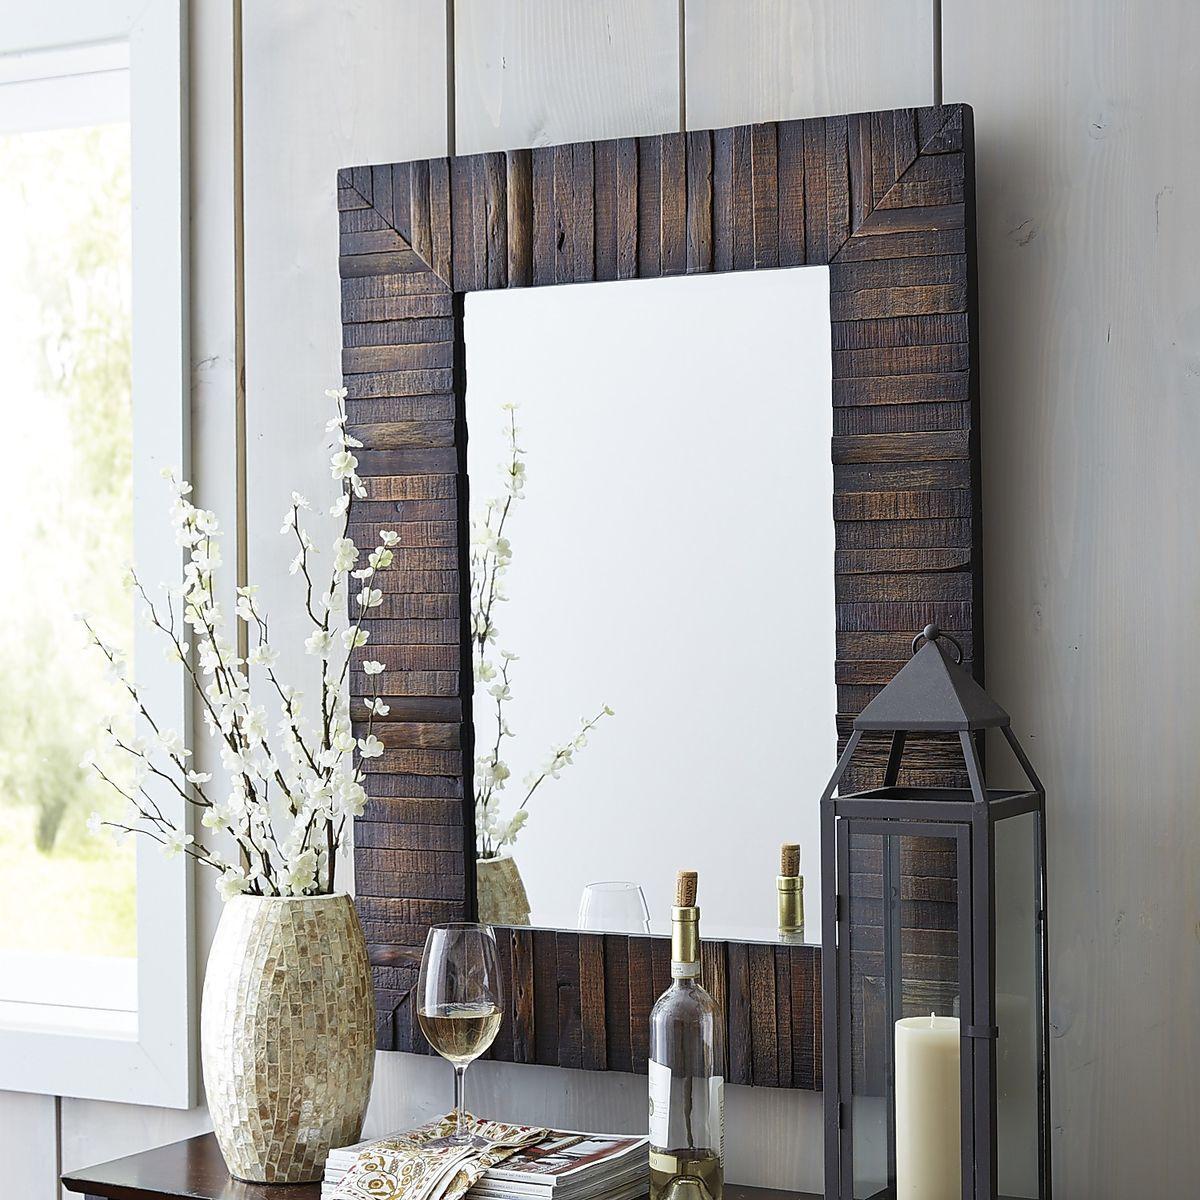 6 pane window frame ideas  eternal wood framed x mirror  apartment ideas powder room and